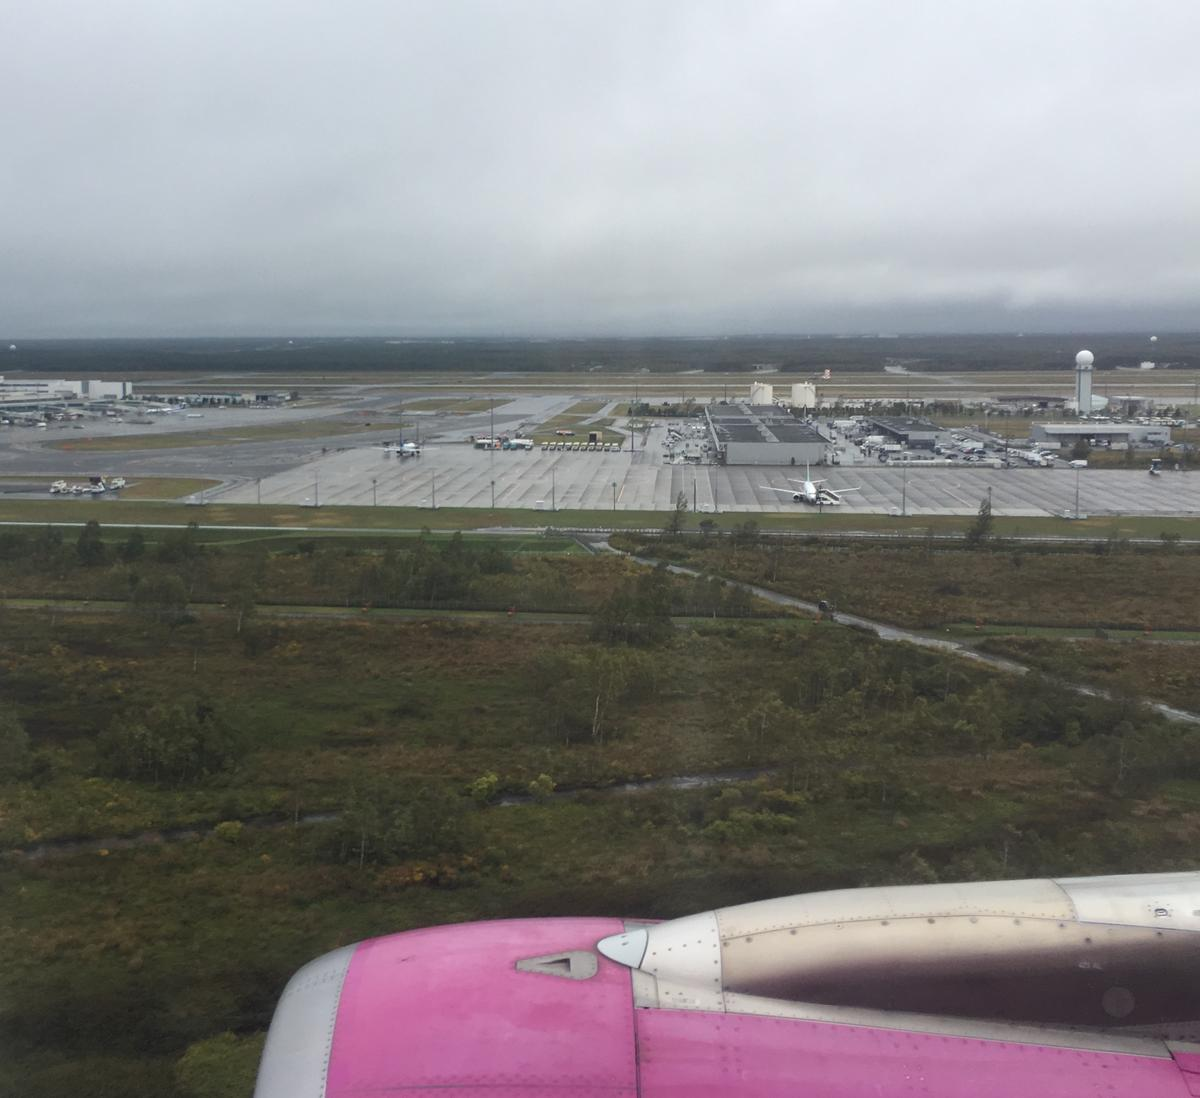 LCC航空会社peachで北海道の新千歳空港へ向かう飛行中7